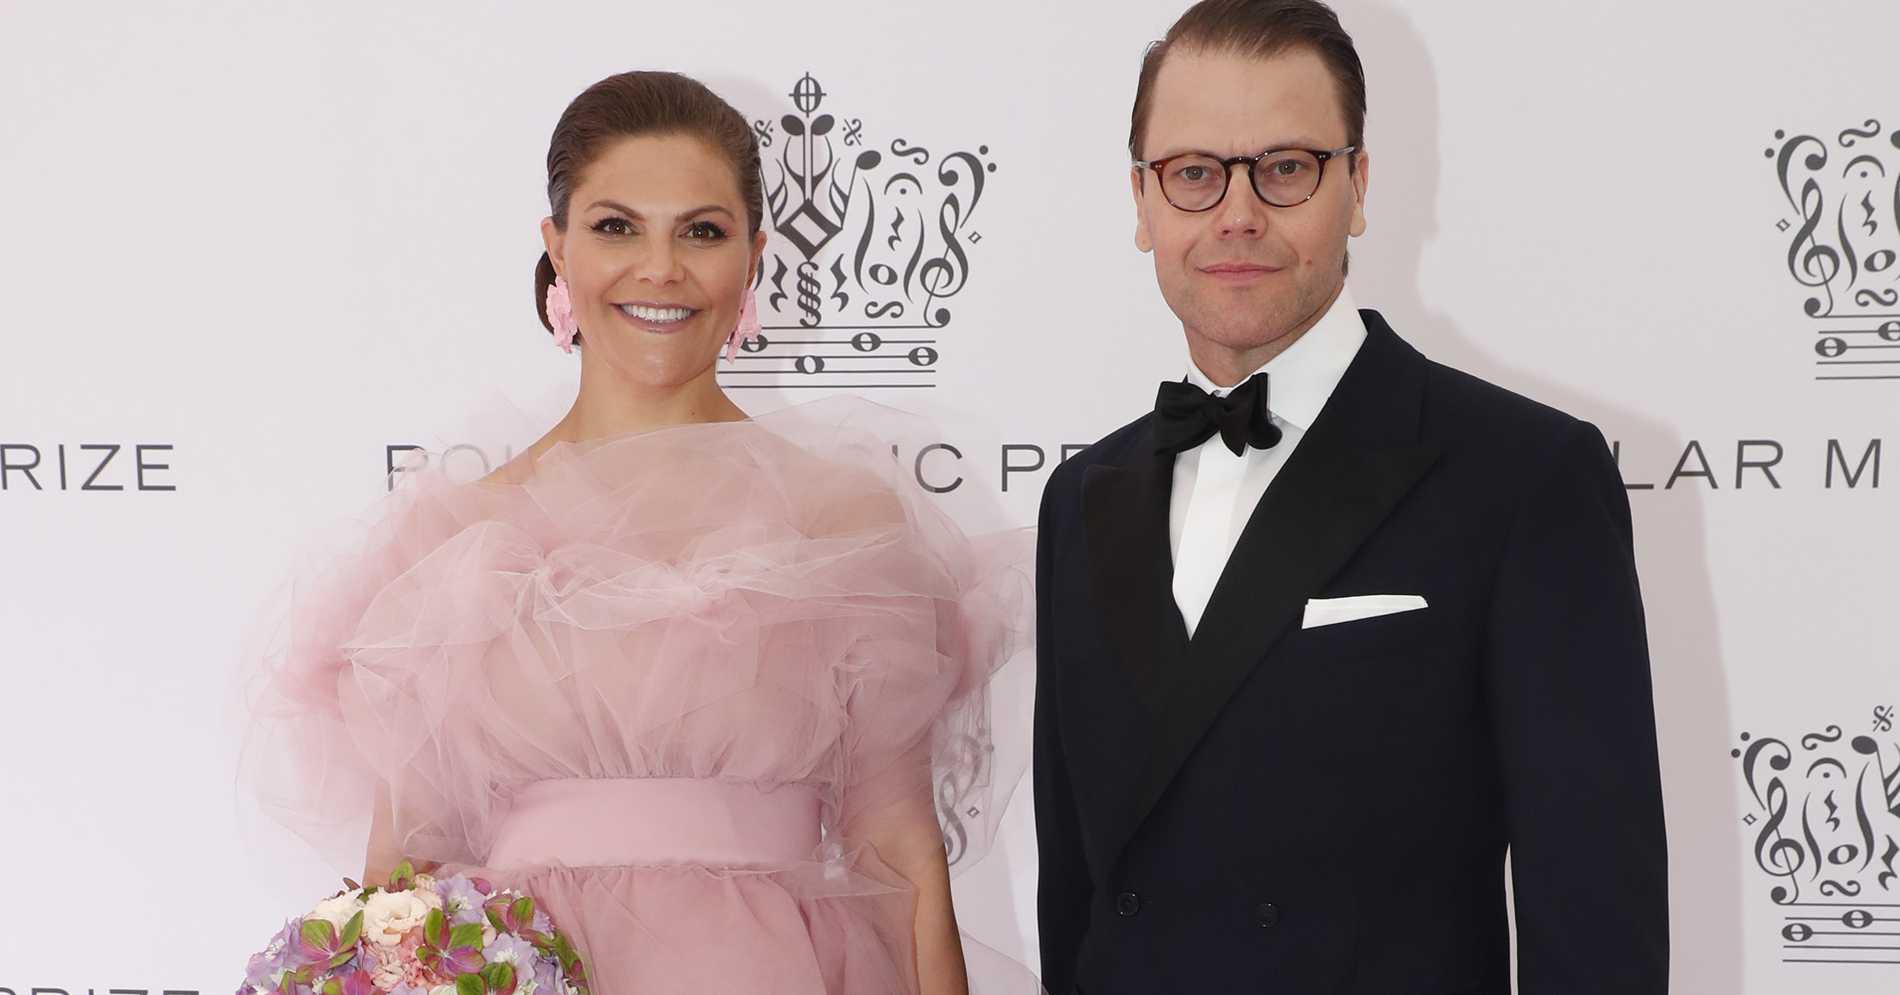 7249d626a7ce Kronprinsessan valde svenska designern Selam Fessahaye | Aftonbladet